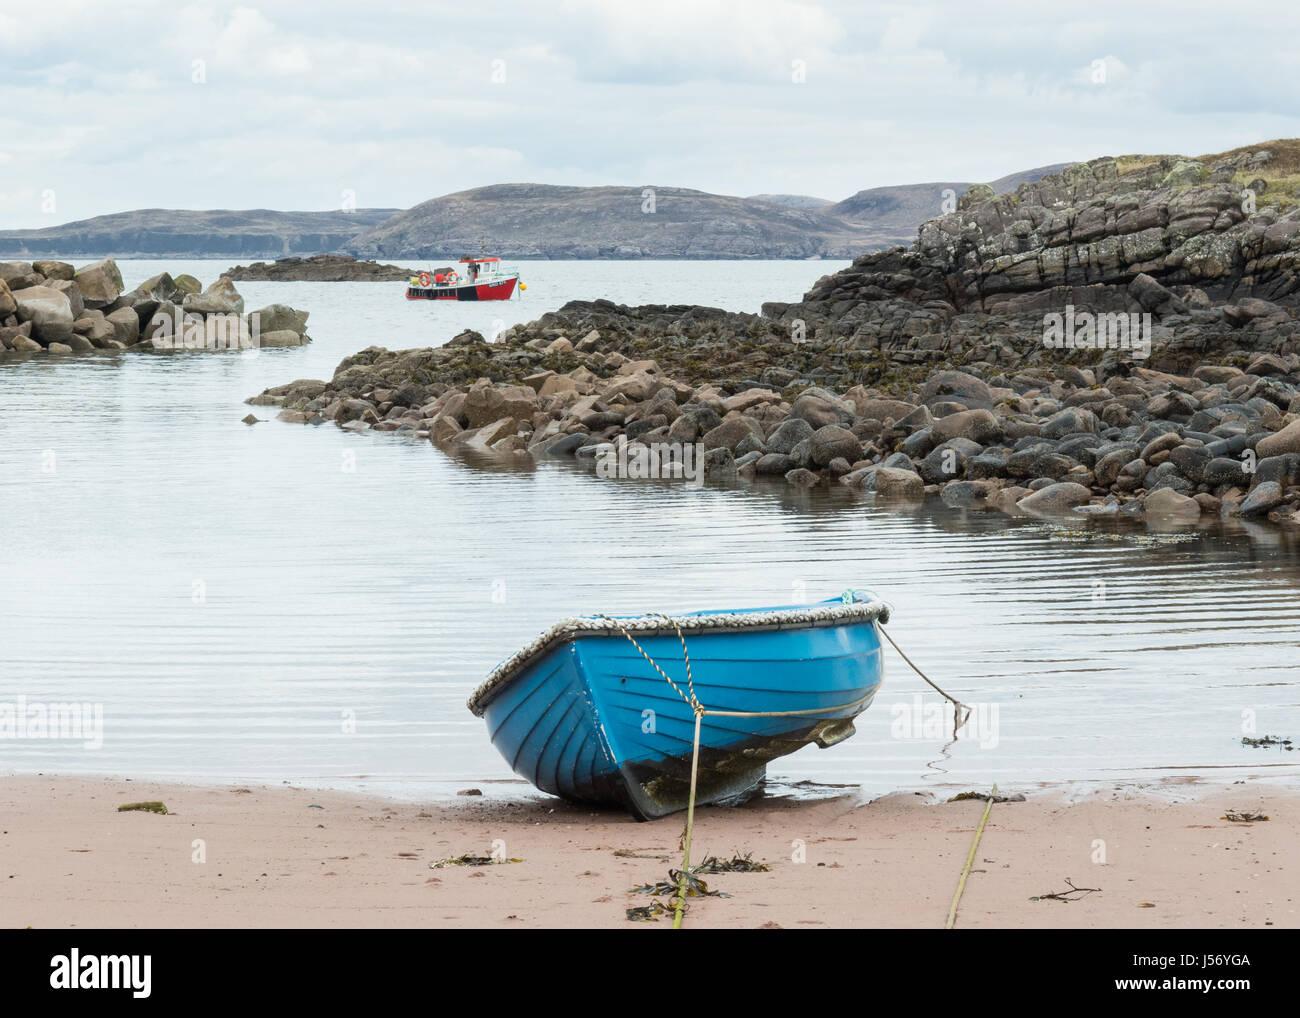 Boote am Loch Ewe - Bucht-Hafen, Poolewe, Wester Ross, Highland, Schottland, UK Stockbild